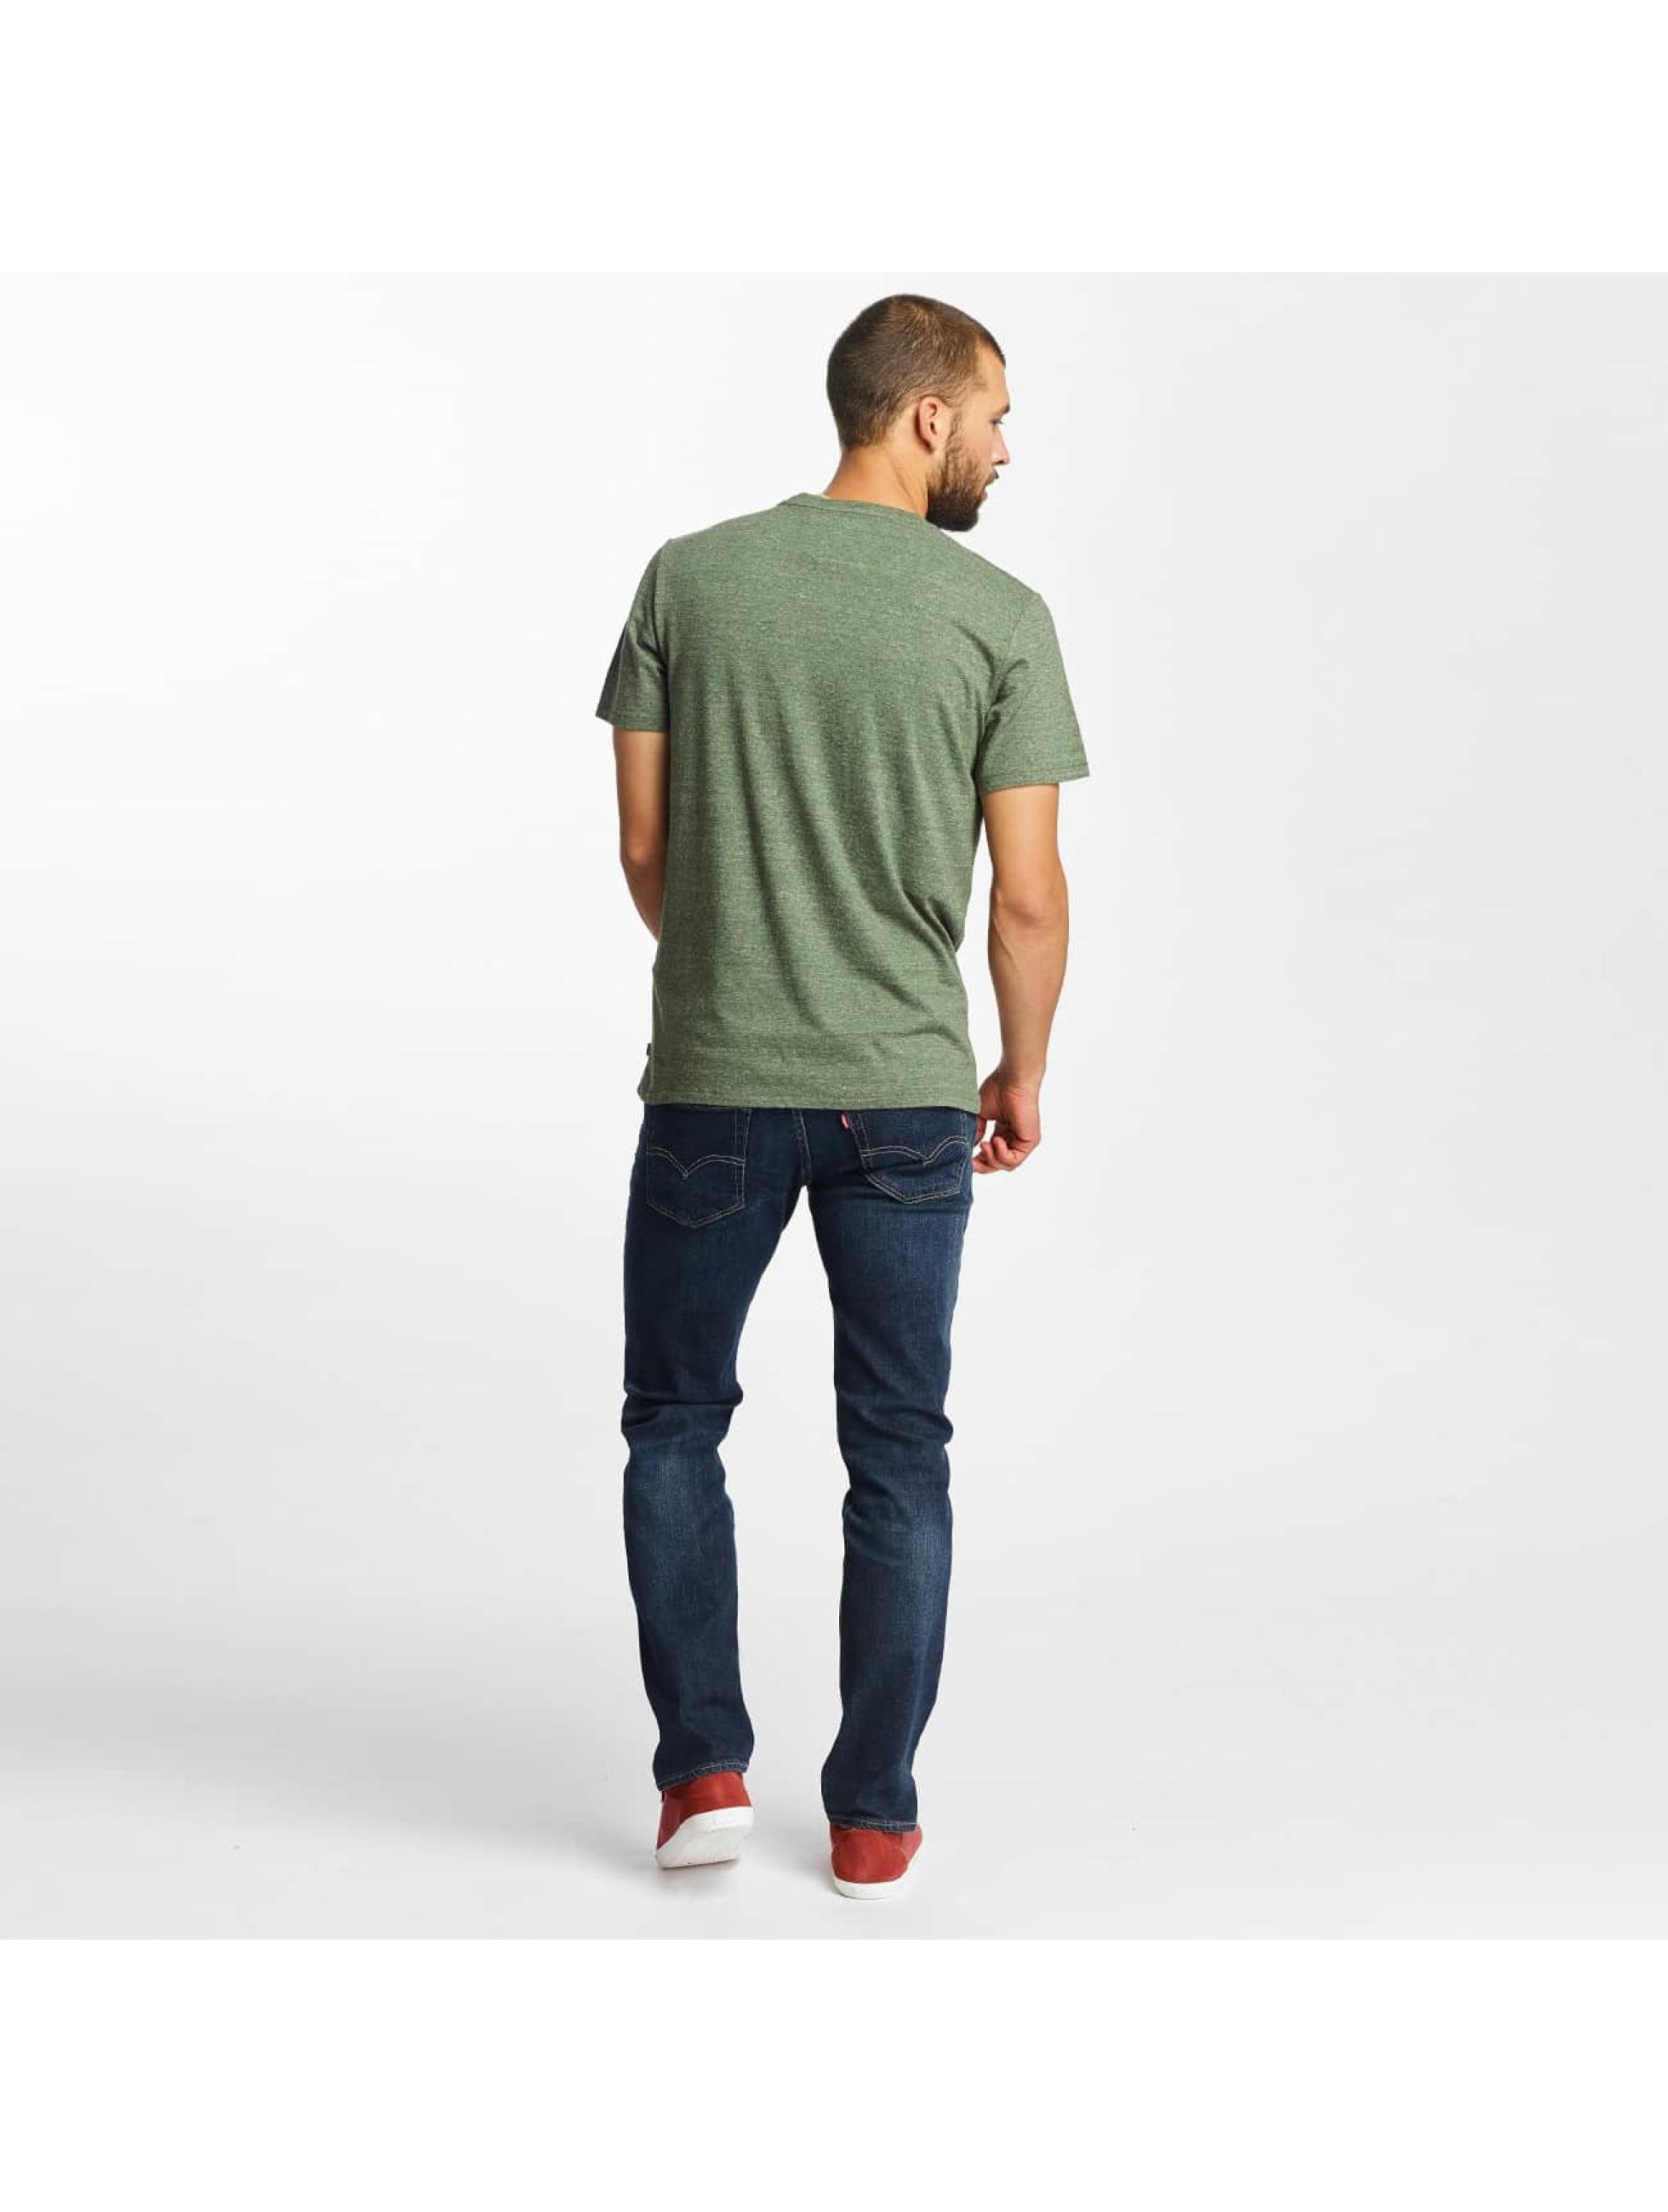 Levi's® T-Shirt Housemark Graphic olive